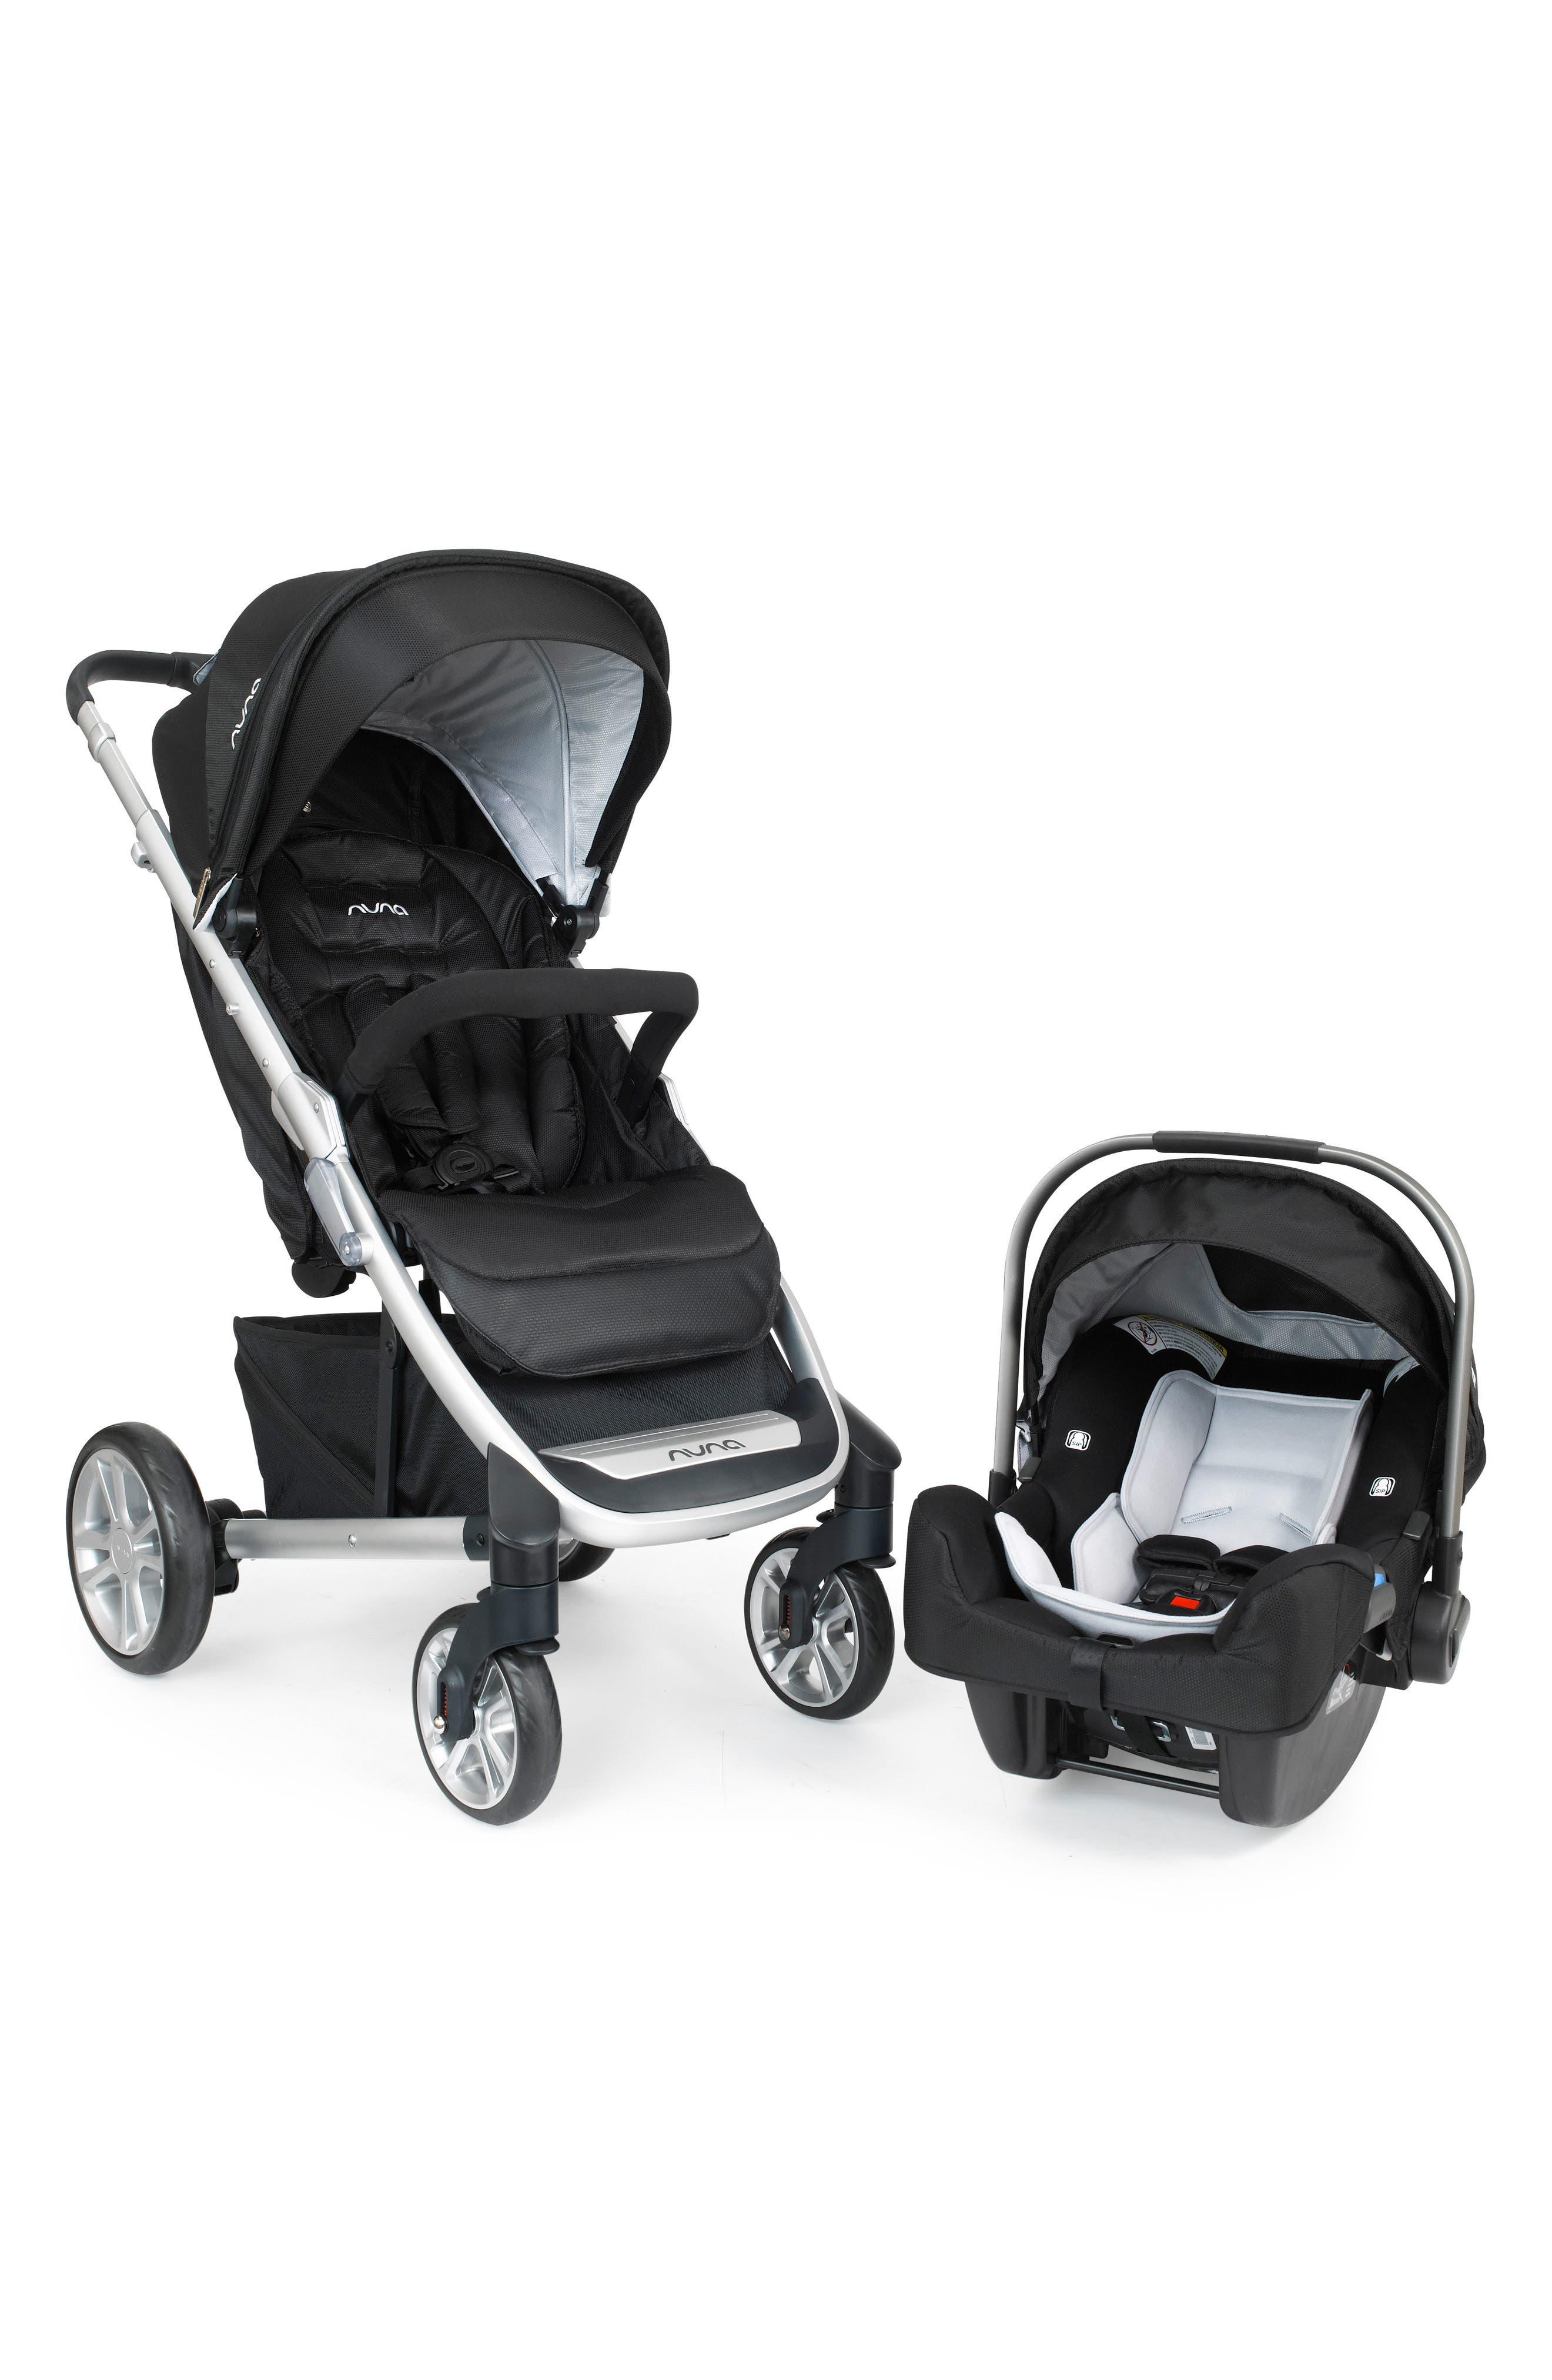 Alternate Image 1 Selected - nuna 'TAVO™' Travel System (Stroller, Car Seat & Base)